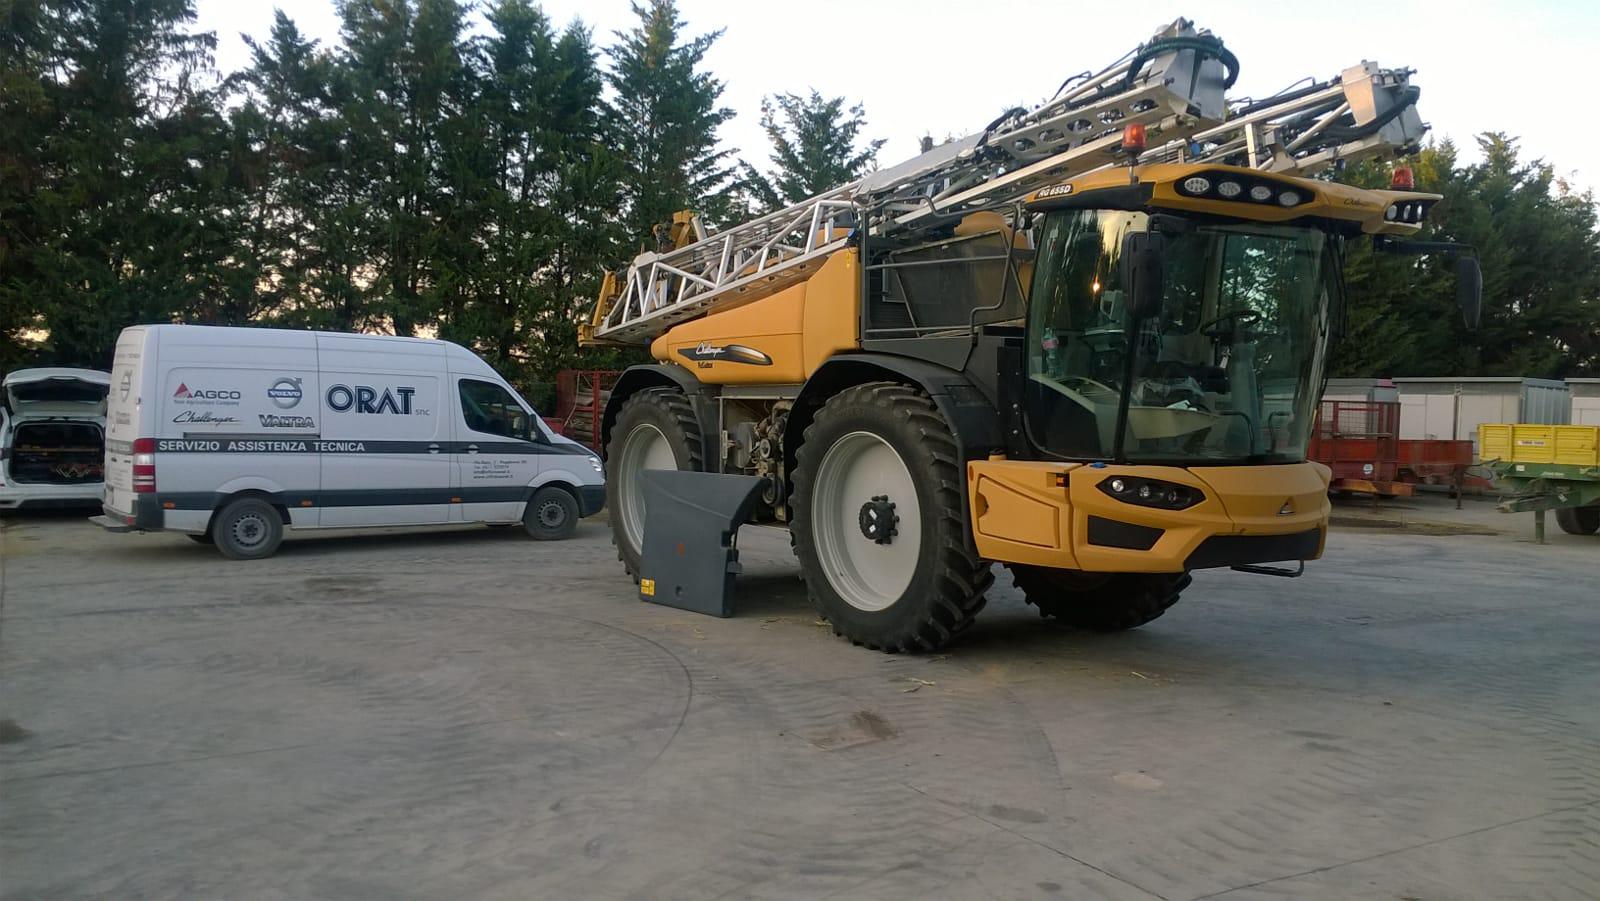 ricambi macchine agricole Siena